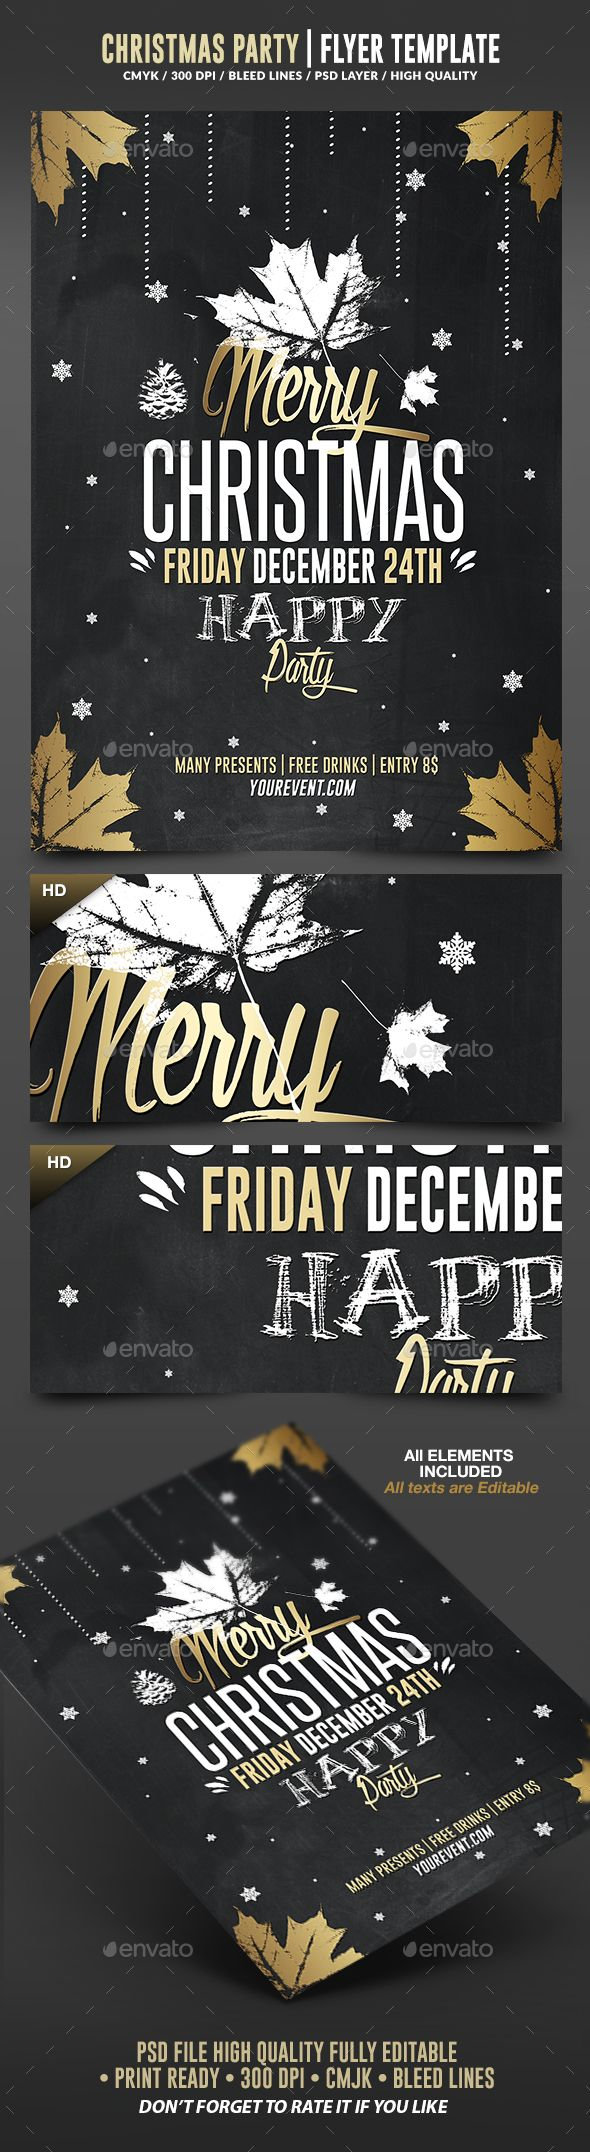 Merry Christmas 2016 Flyer Template PSD #design #xmas Download: http://graphicriver.net/item/christmas-2016-psd-flyer-template/13736107?ref=ksioks